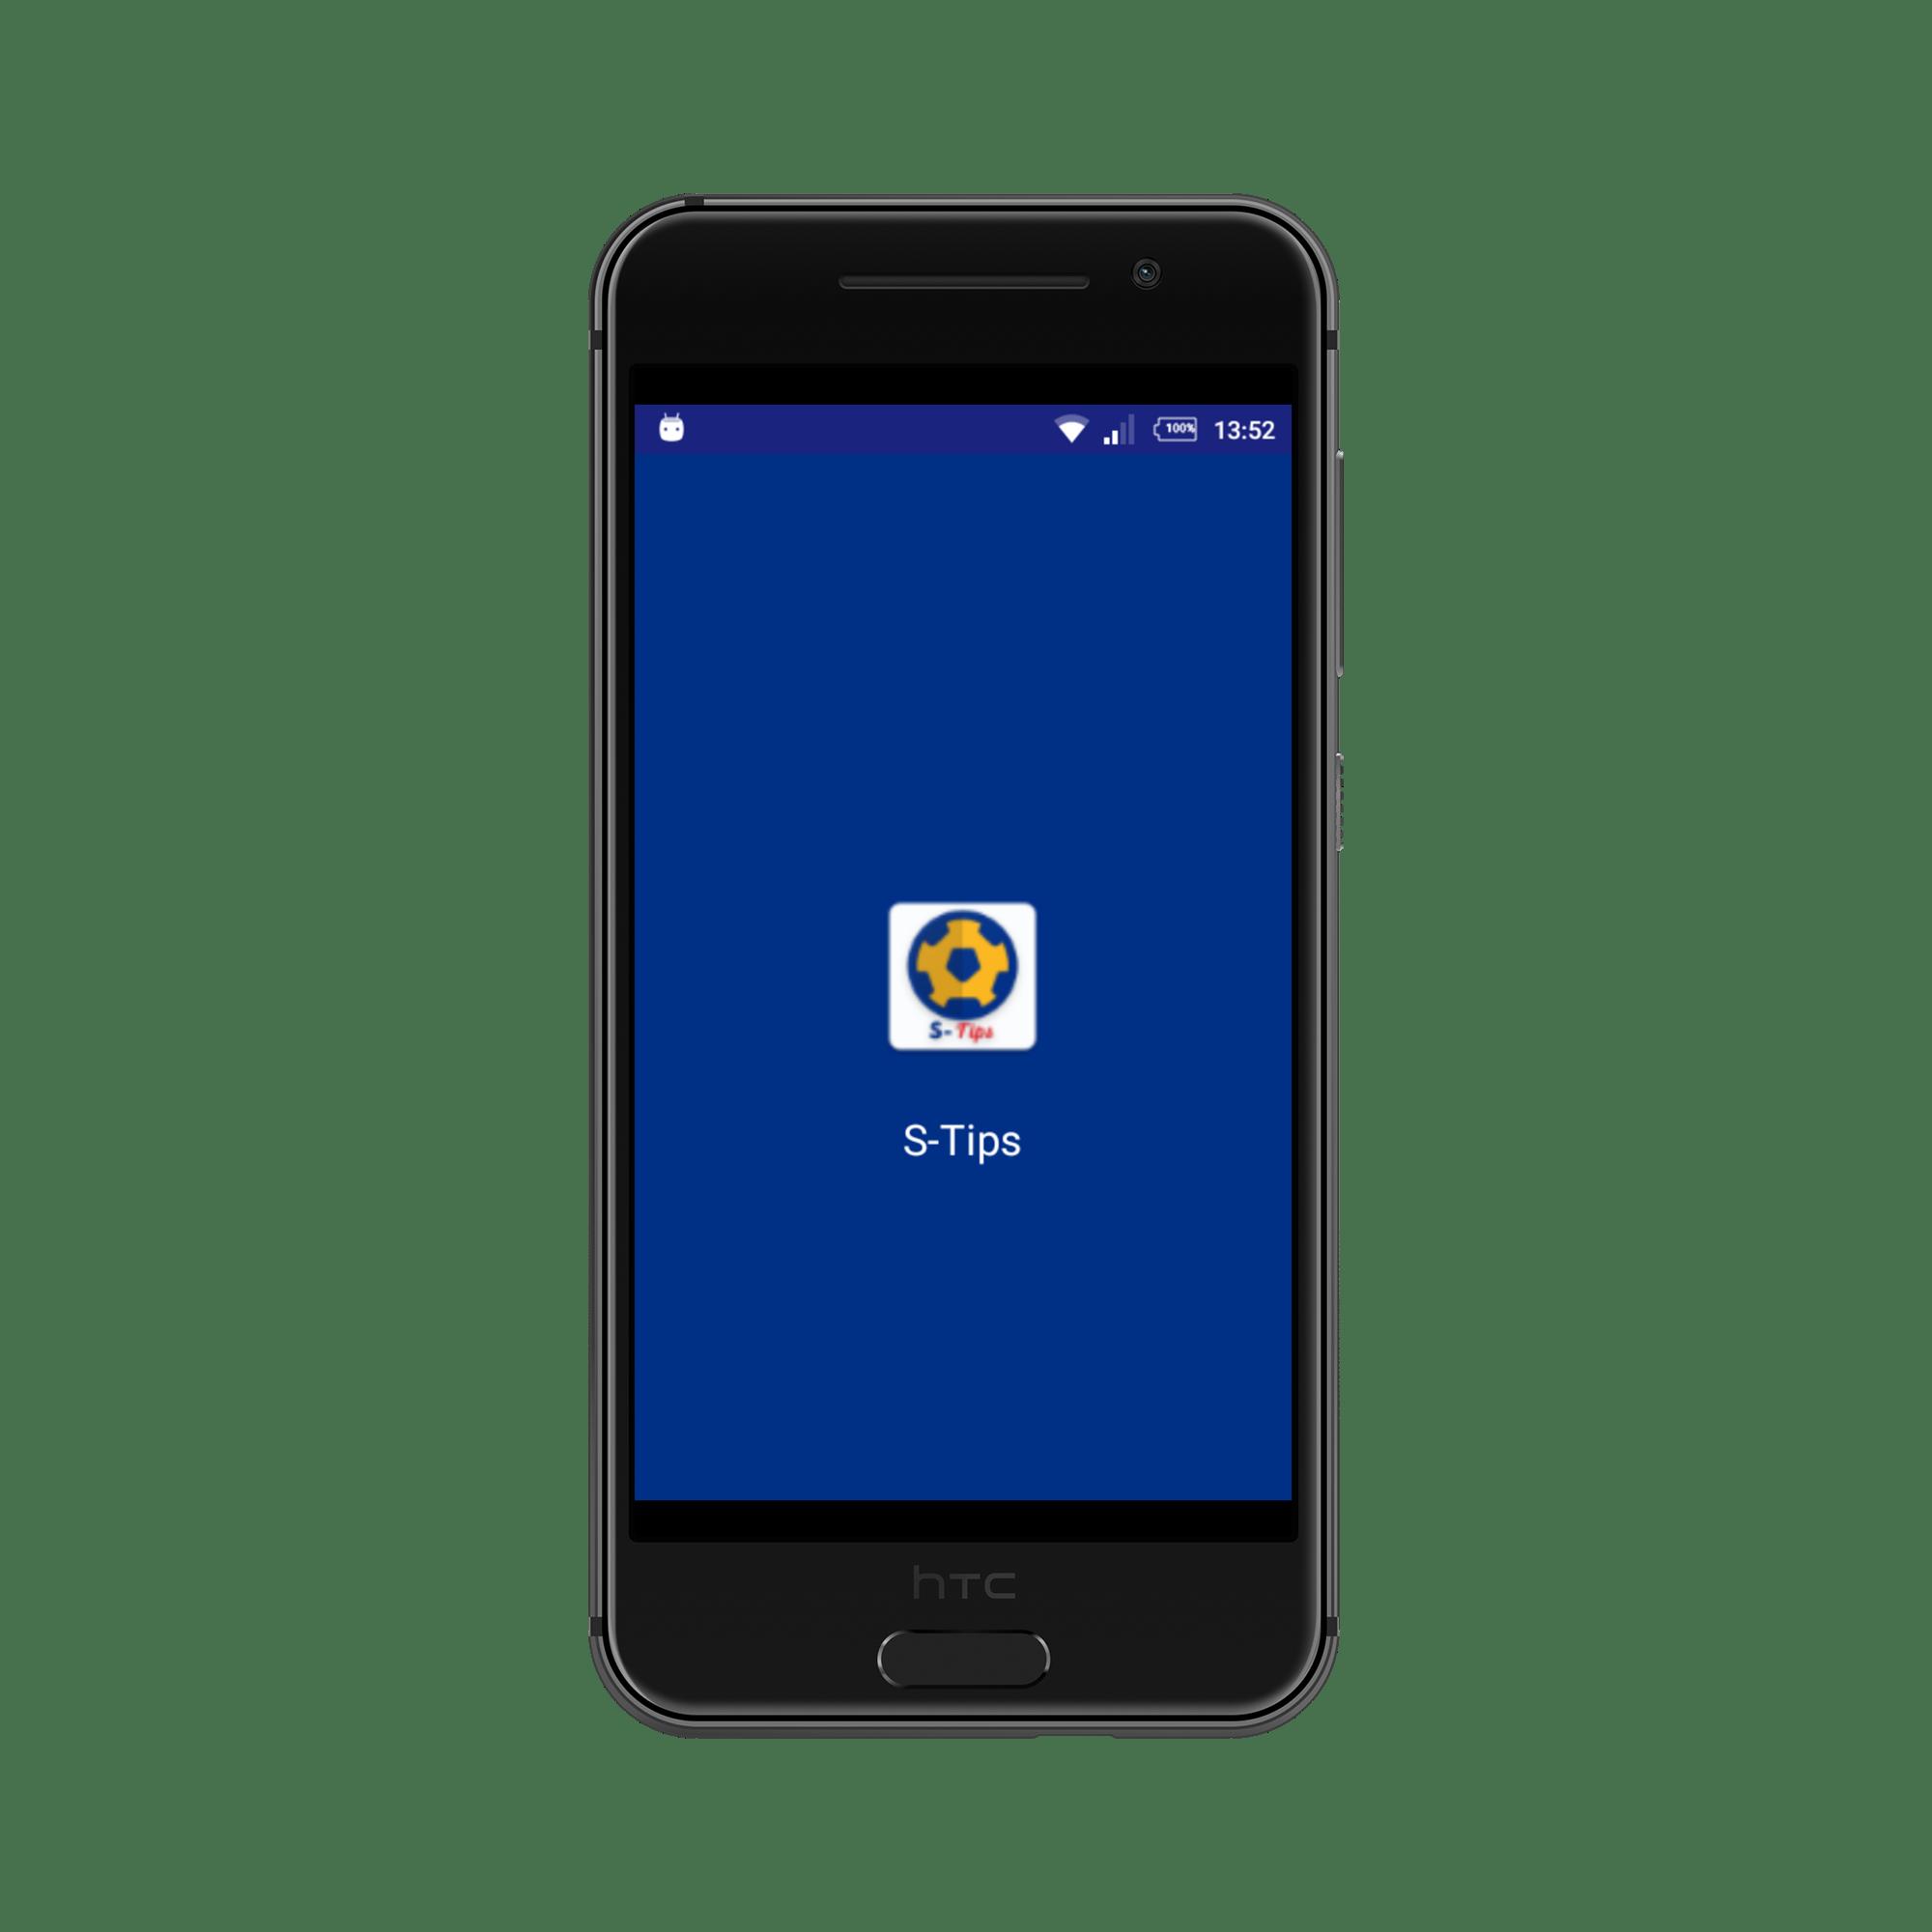 Sportpesatips Android app